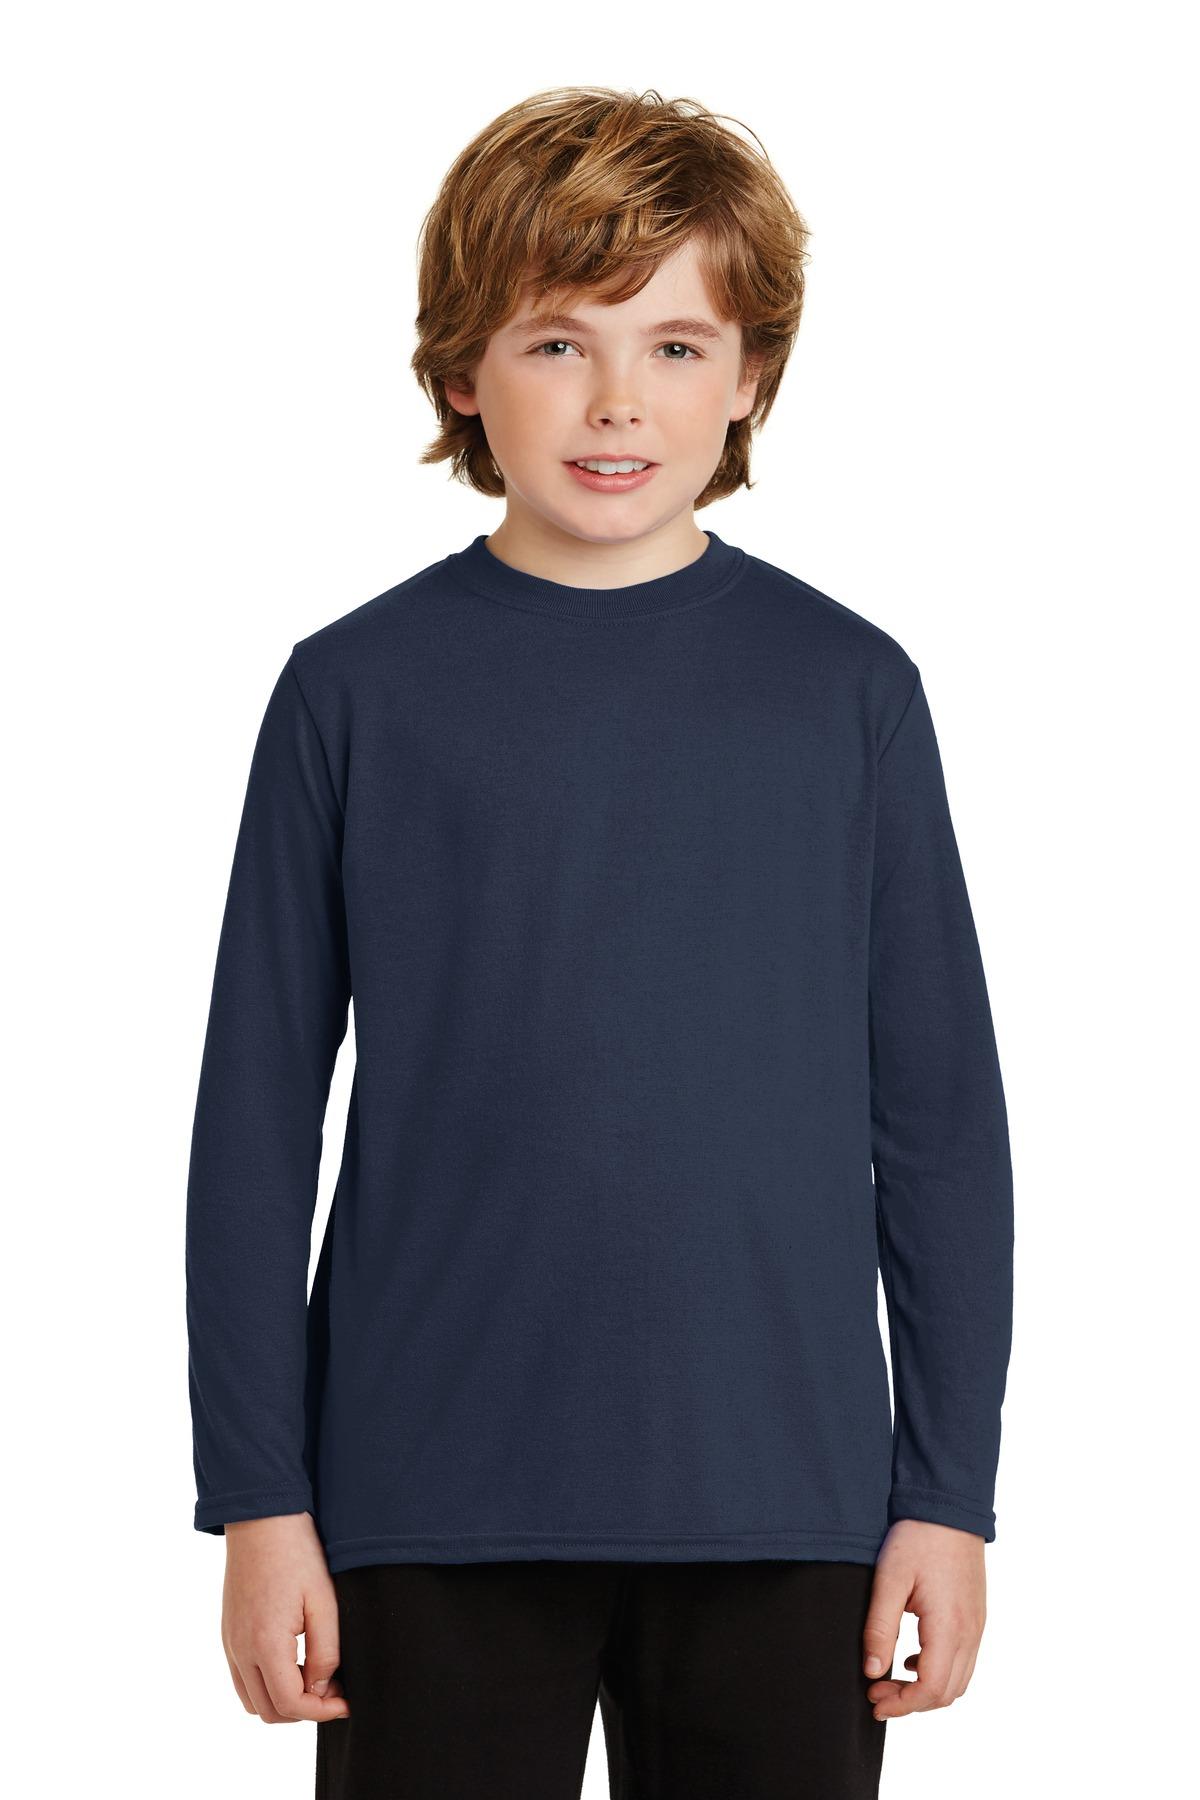 SanMar Gildan 42400B, Gildan® Youth Gildan Performance® Long Sleeve T-Shirt.